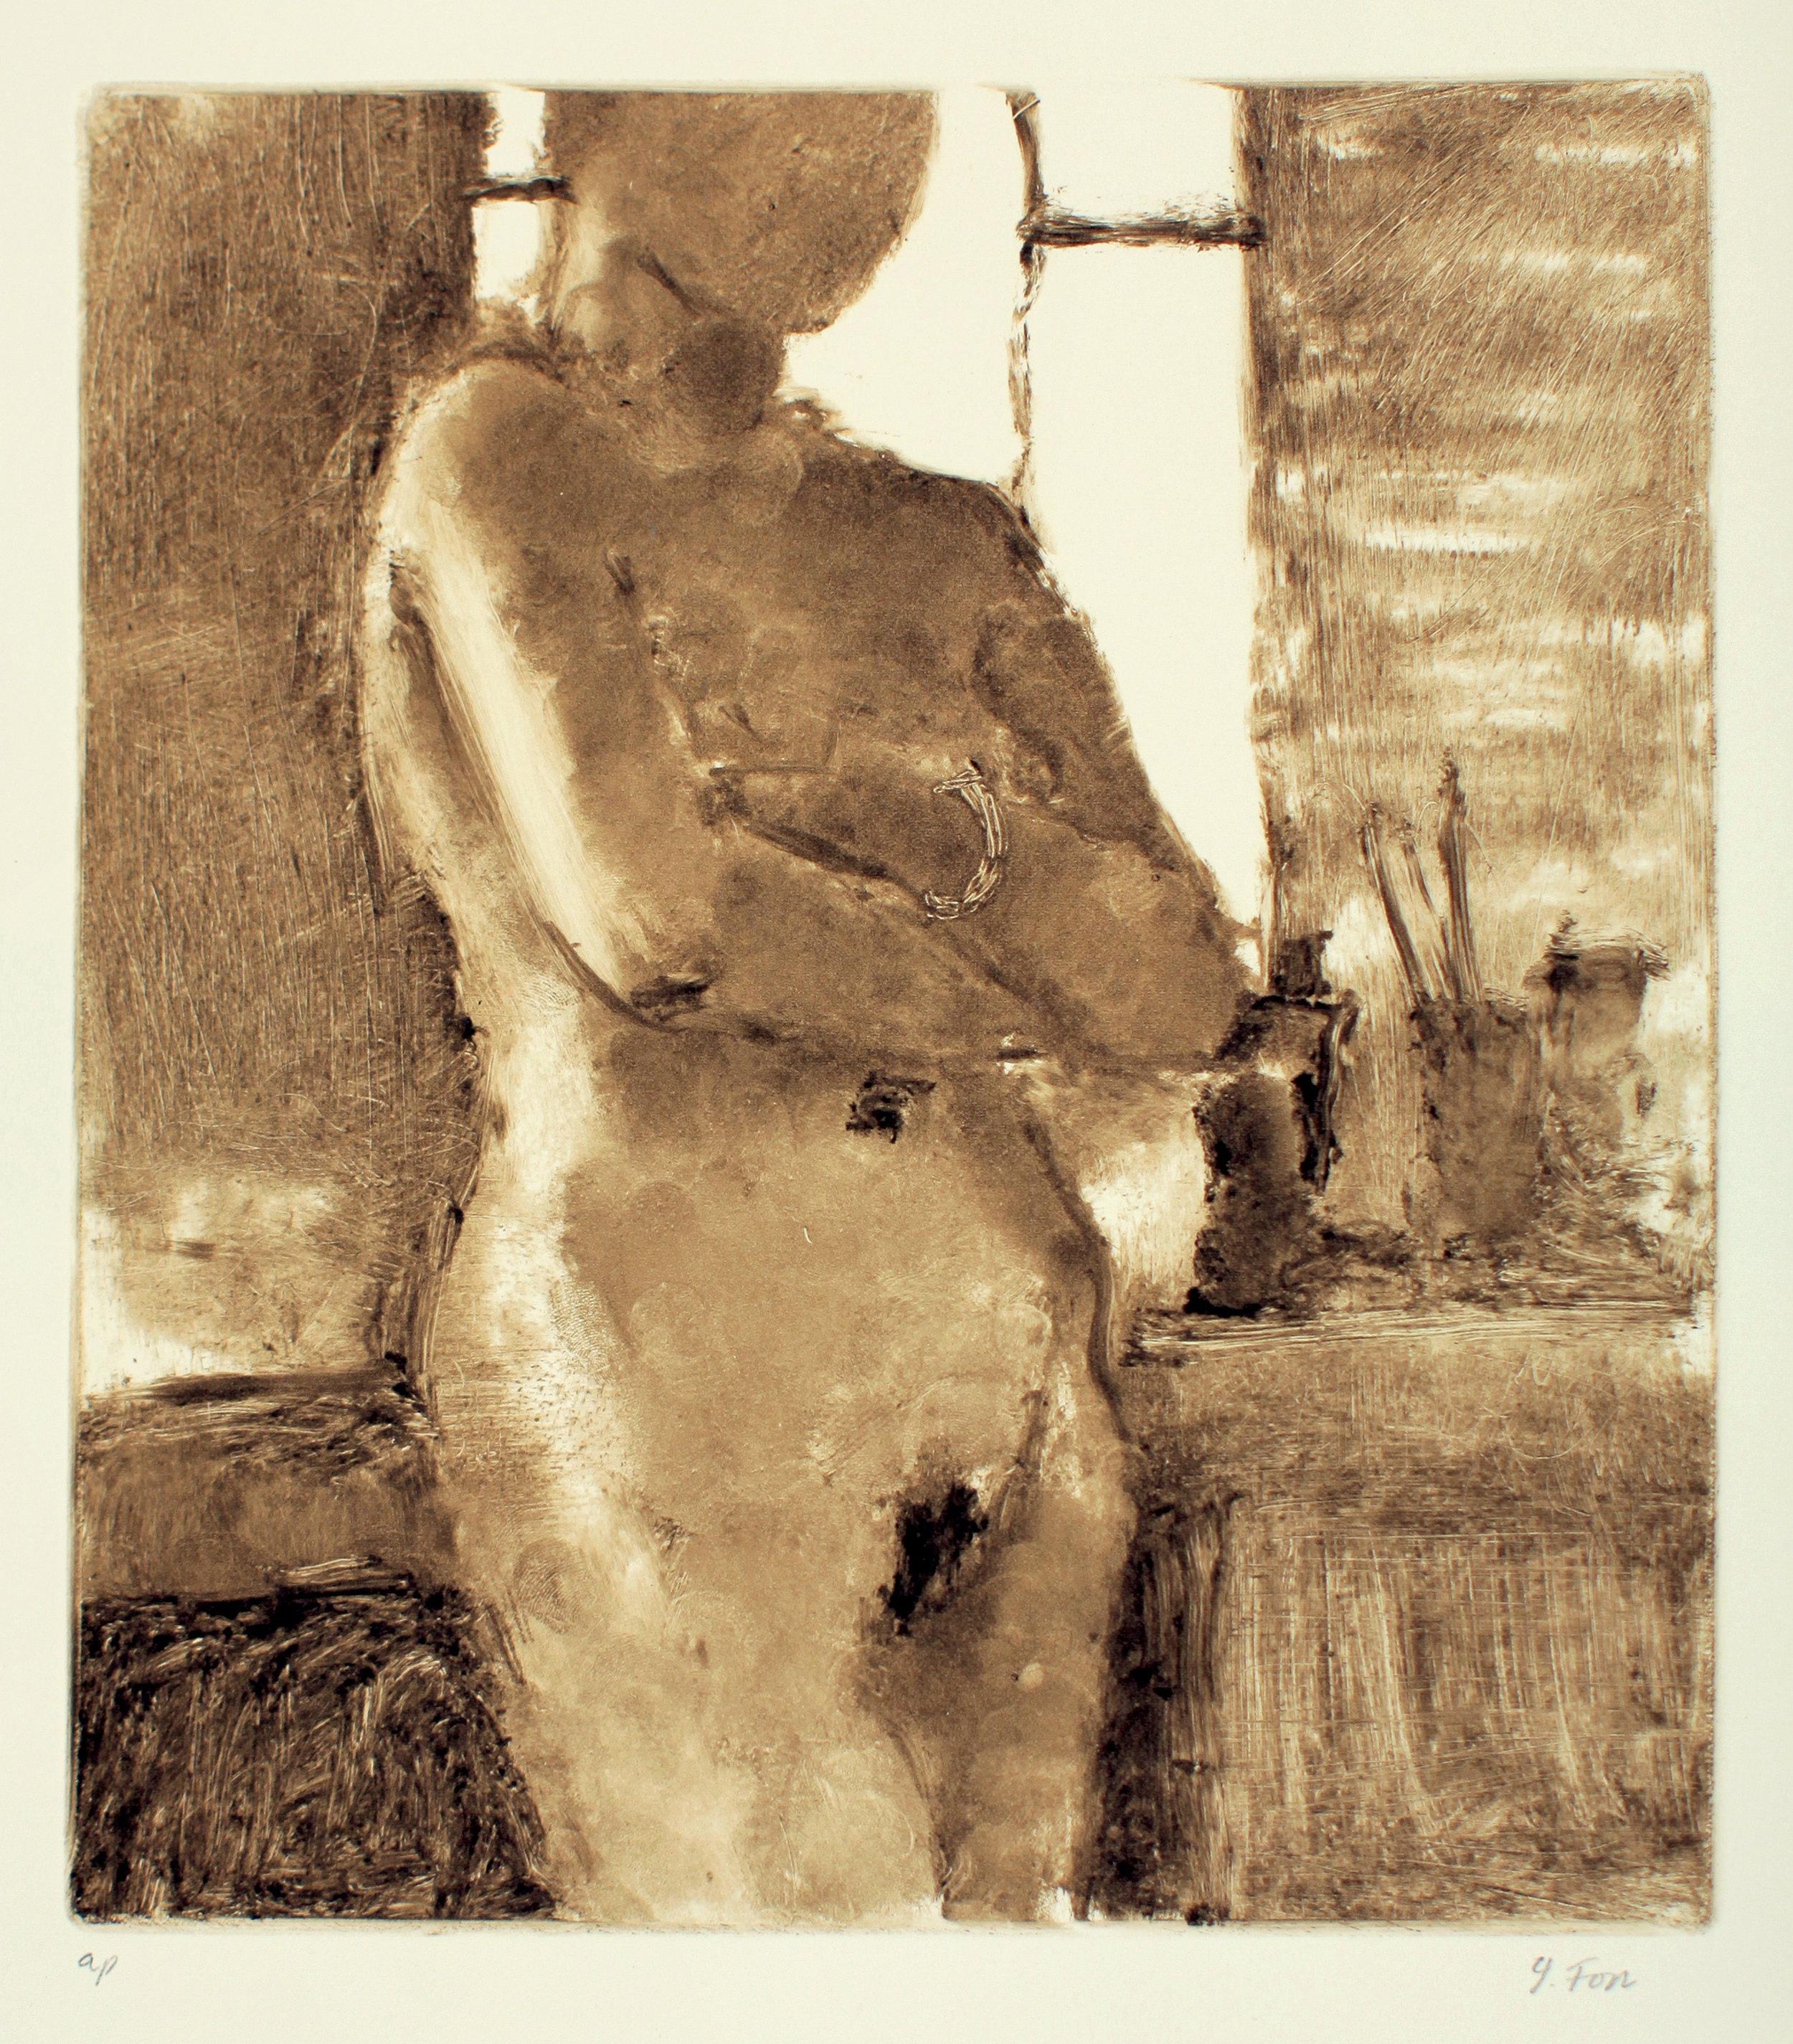 1990_Nude_Against_the_Window_momotype_on_paper_22x18in_WPF440.jpg